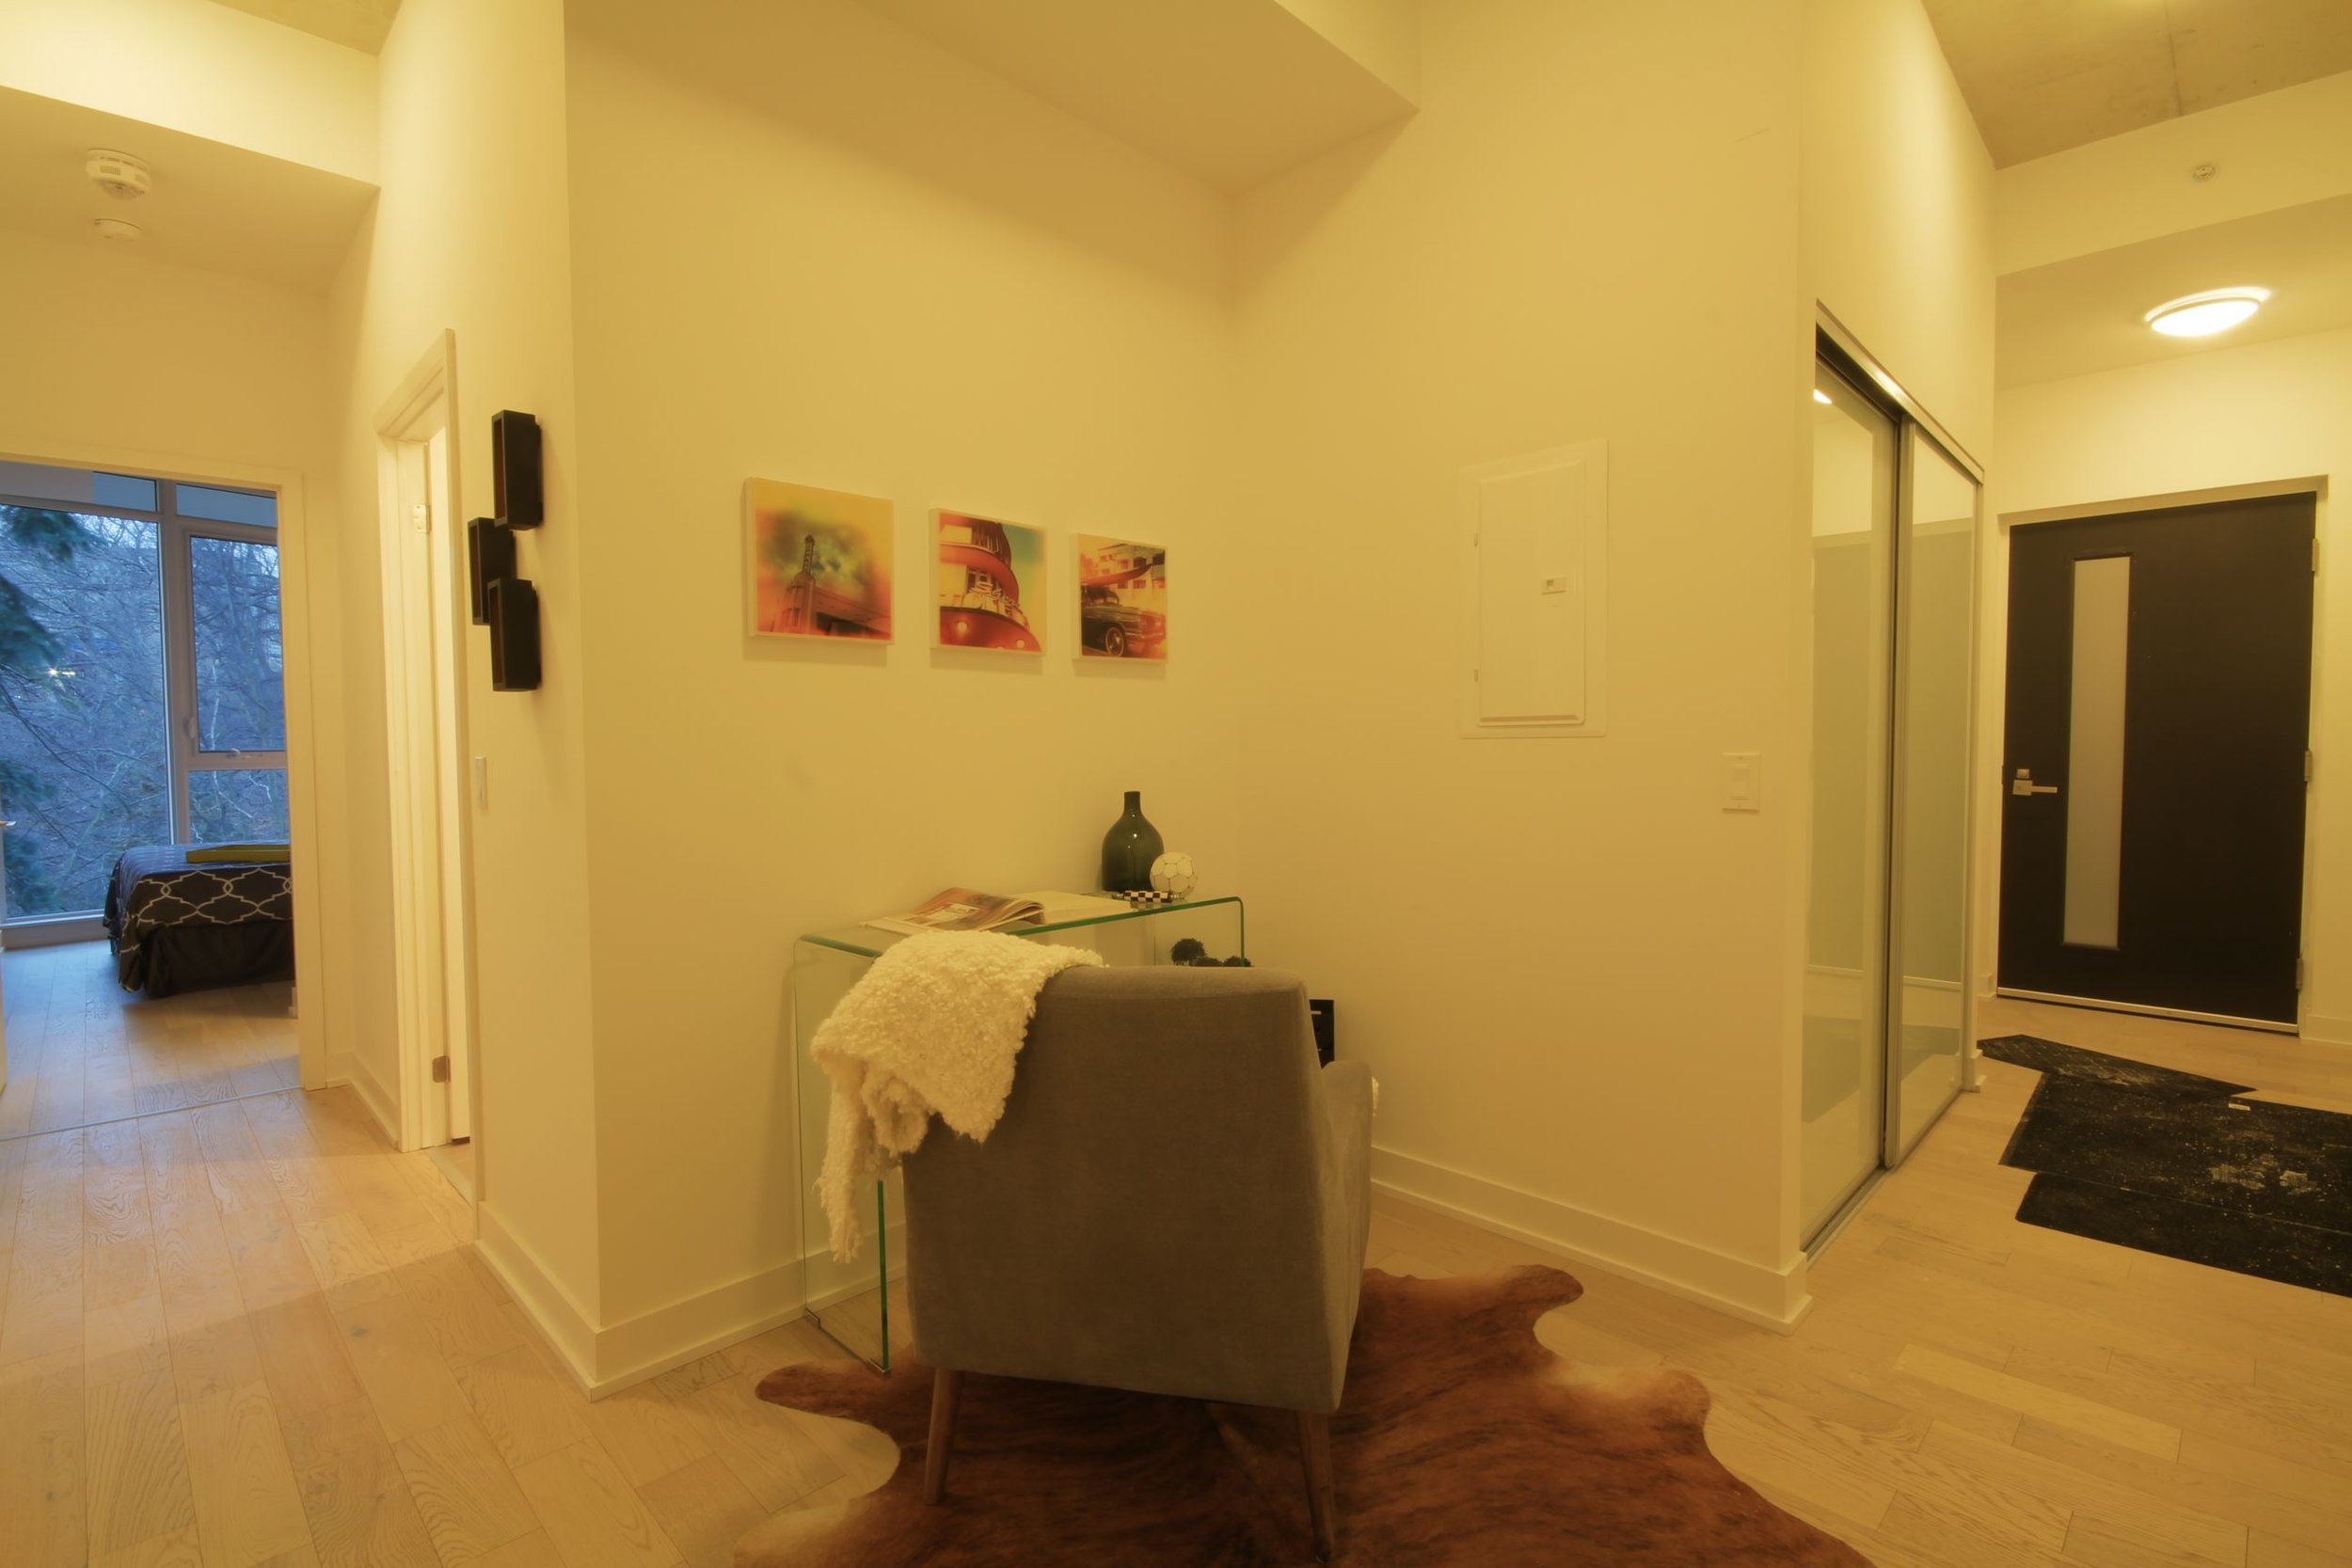 02 Office Area.jpg